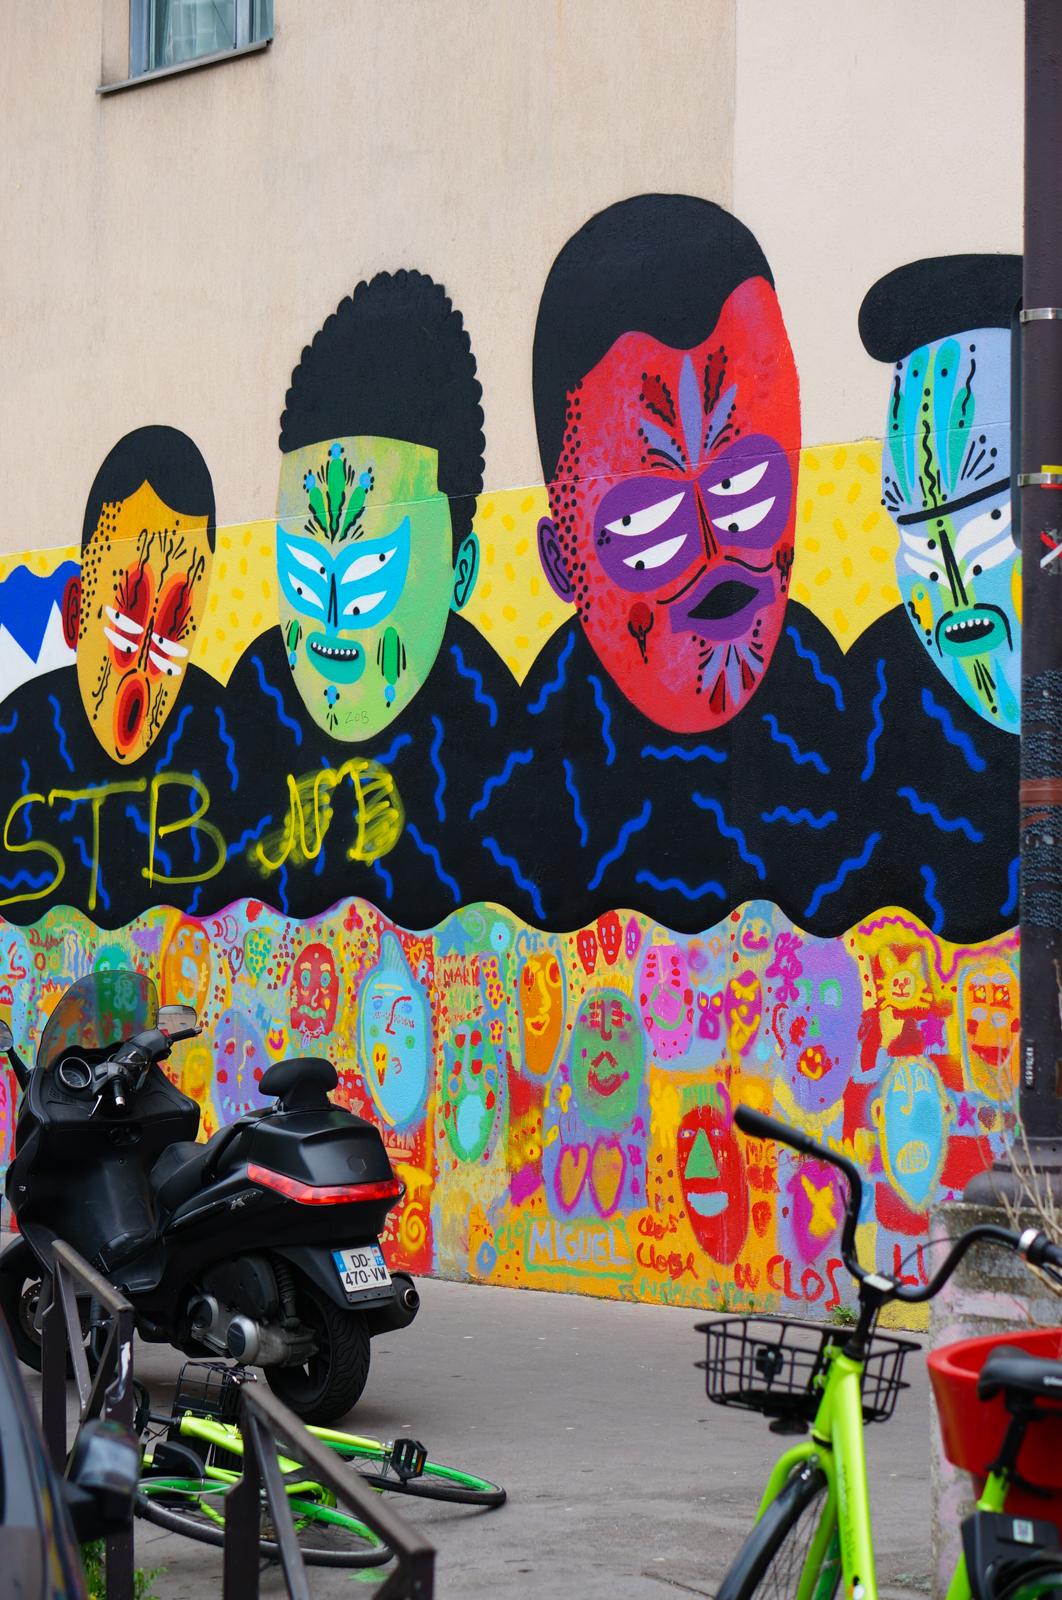 paris 20, balade paris 20, paris underground, paris alternatif, paris insolite, découvrir paris 20, que faire paris 20, balade originale paris 20, paris street art, street art paris 20, kashink